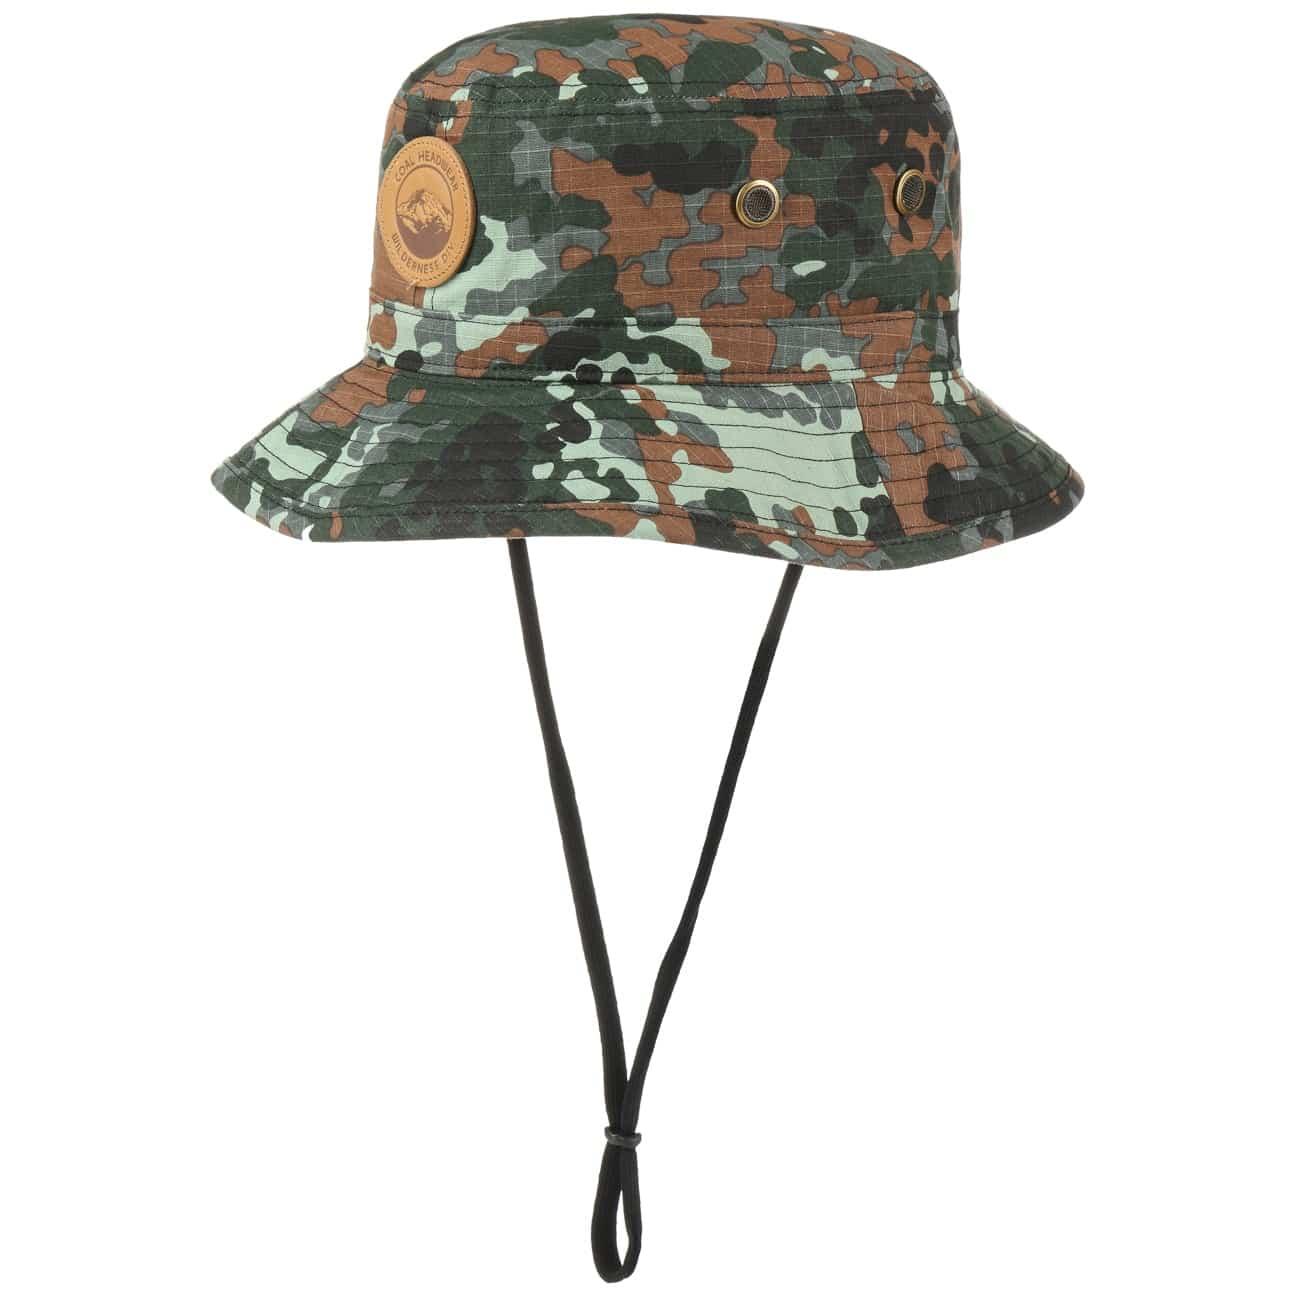 Sombrero de Pescador Speckler Camo by Coal  sombrero